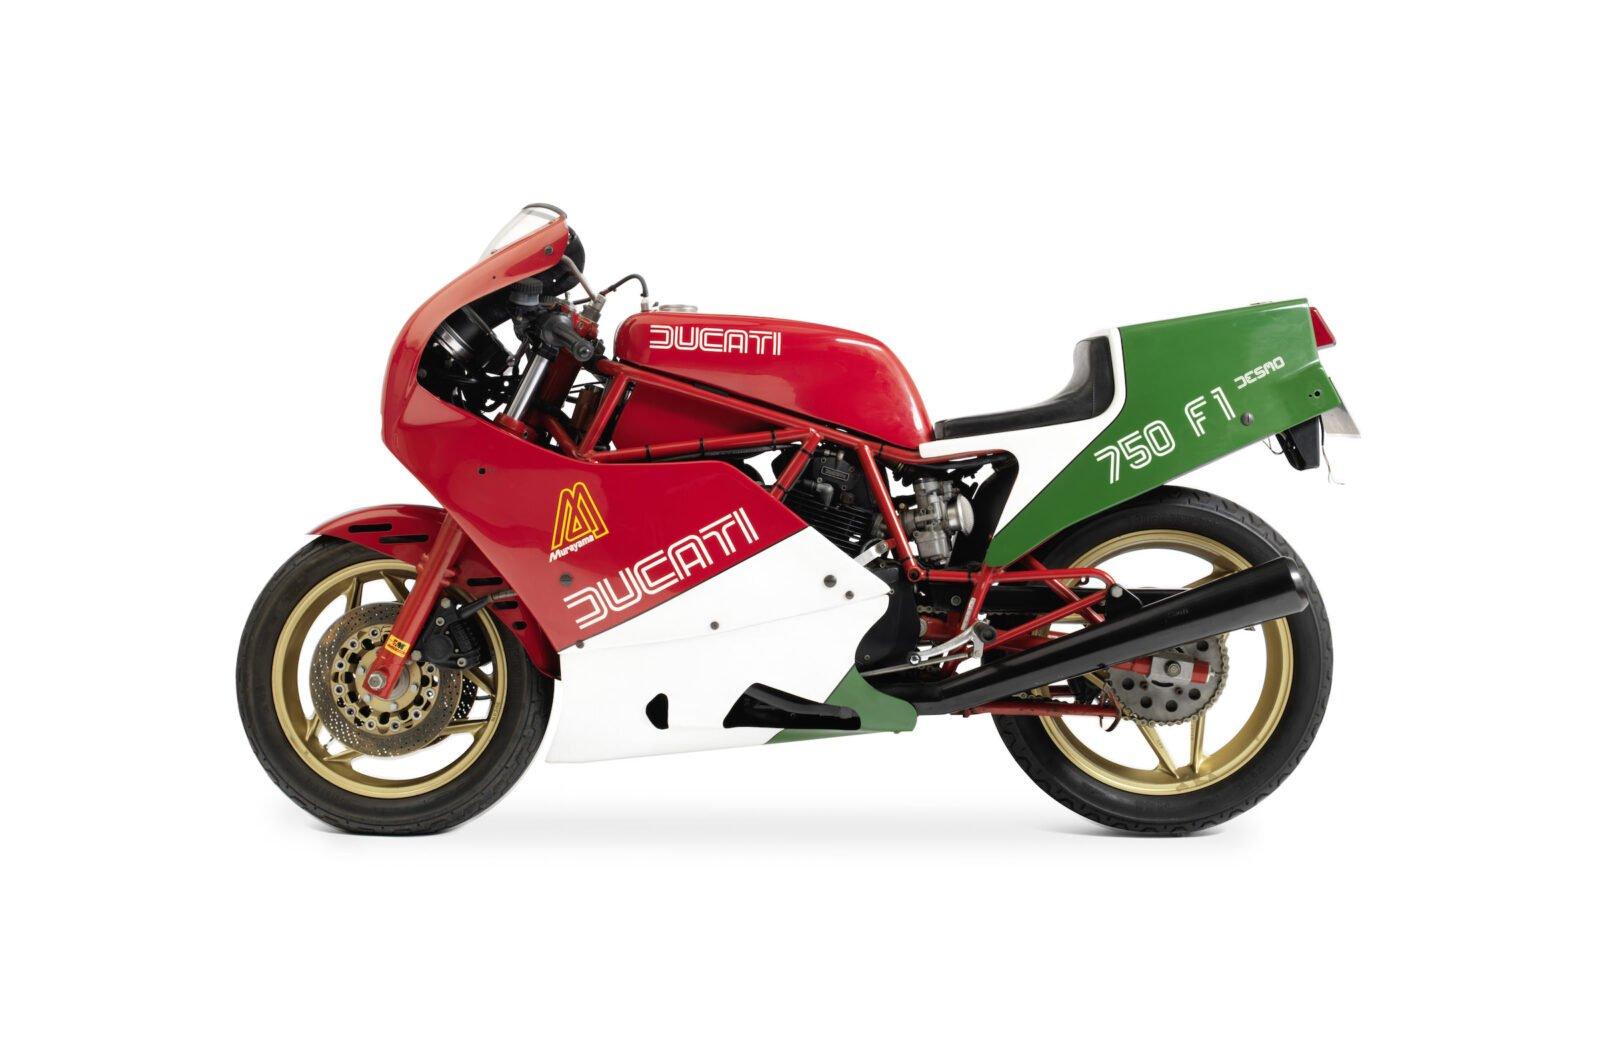 Ducati 750 F1 Motorcycle 1600x1046 - 1985 Ducati 750 F1